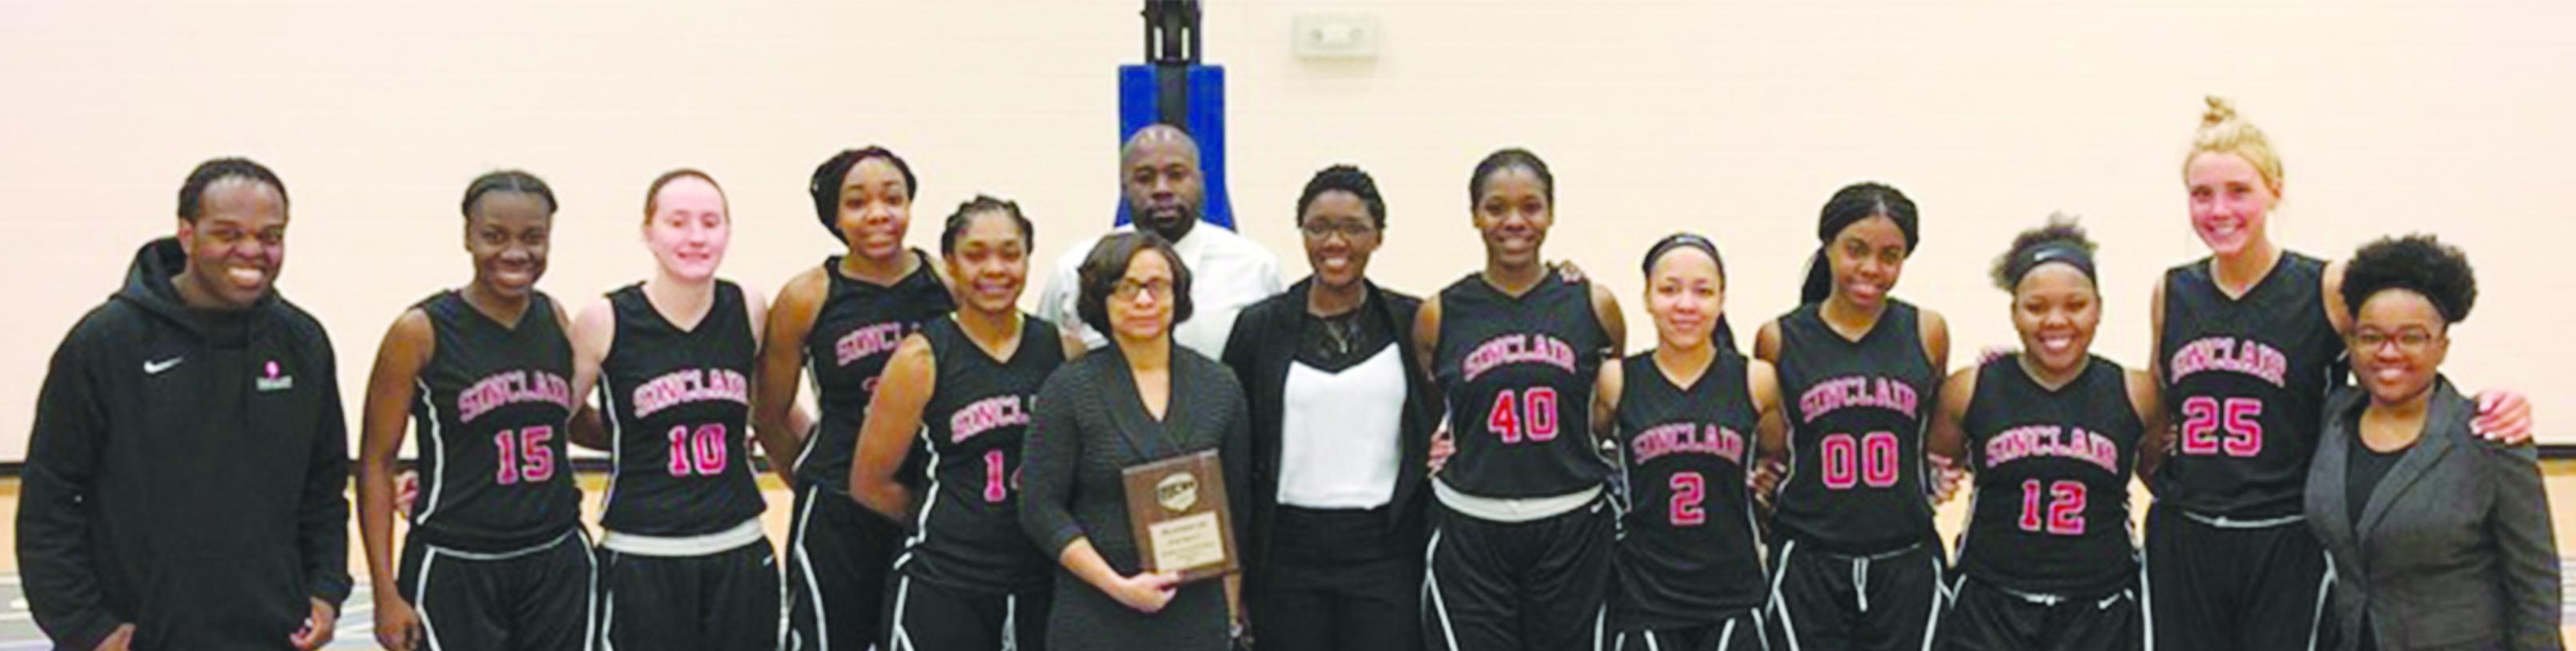 womensbasketballteampic_sinclair athletics